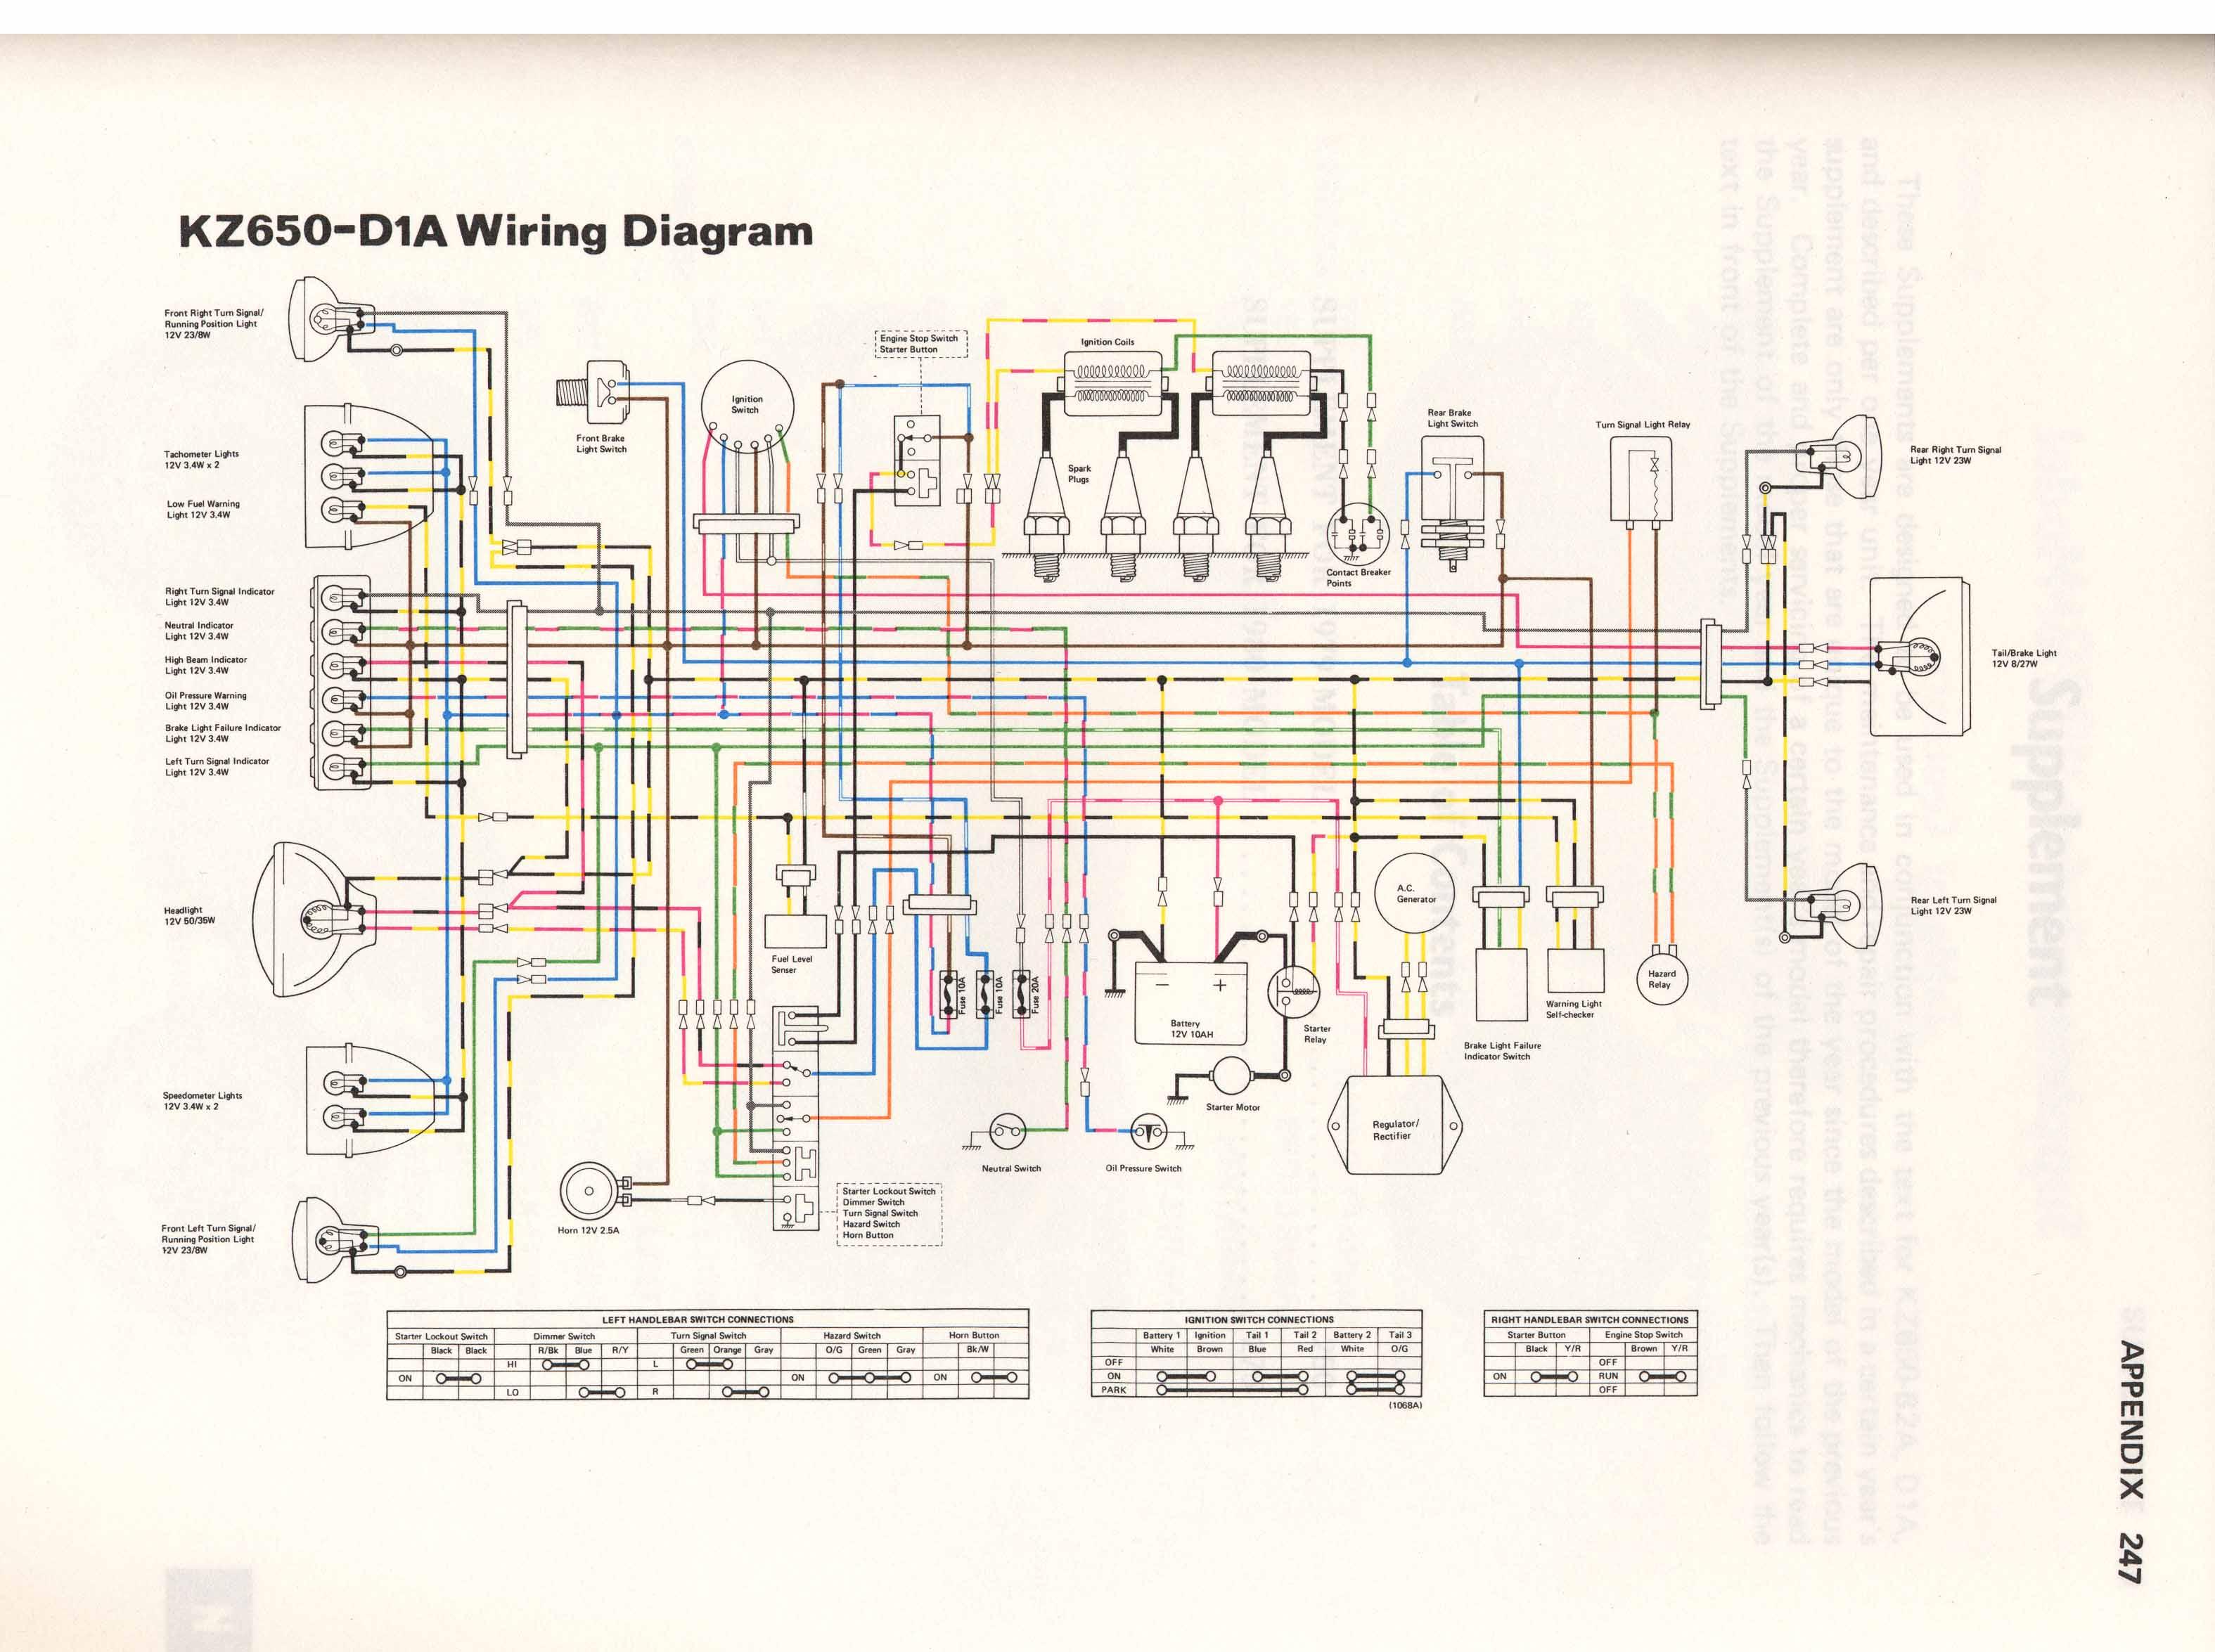 110 Electrical Schematic Wiring Diagram Kz650 Info Wiring Diagrams